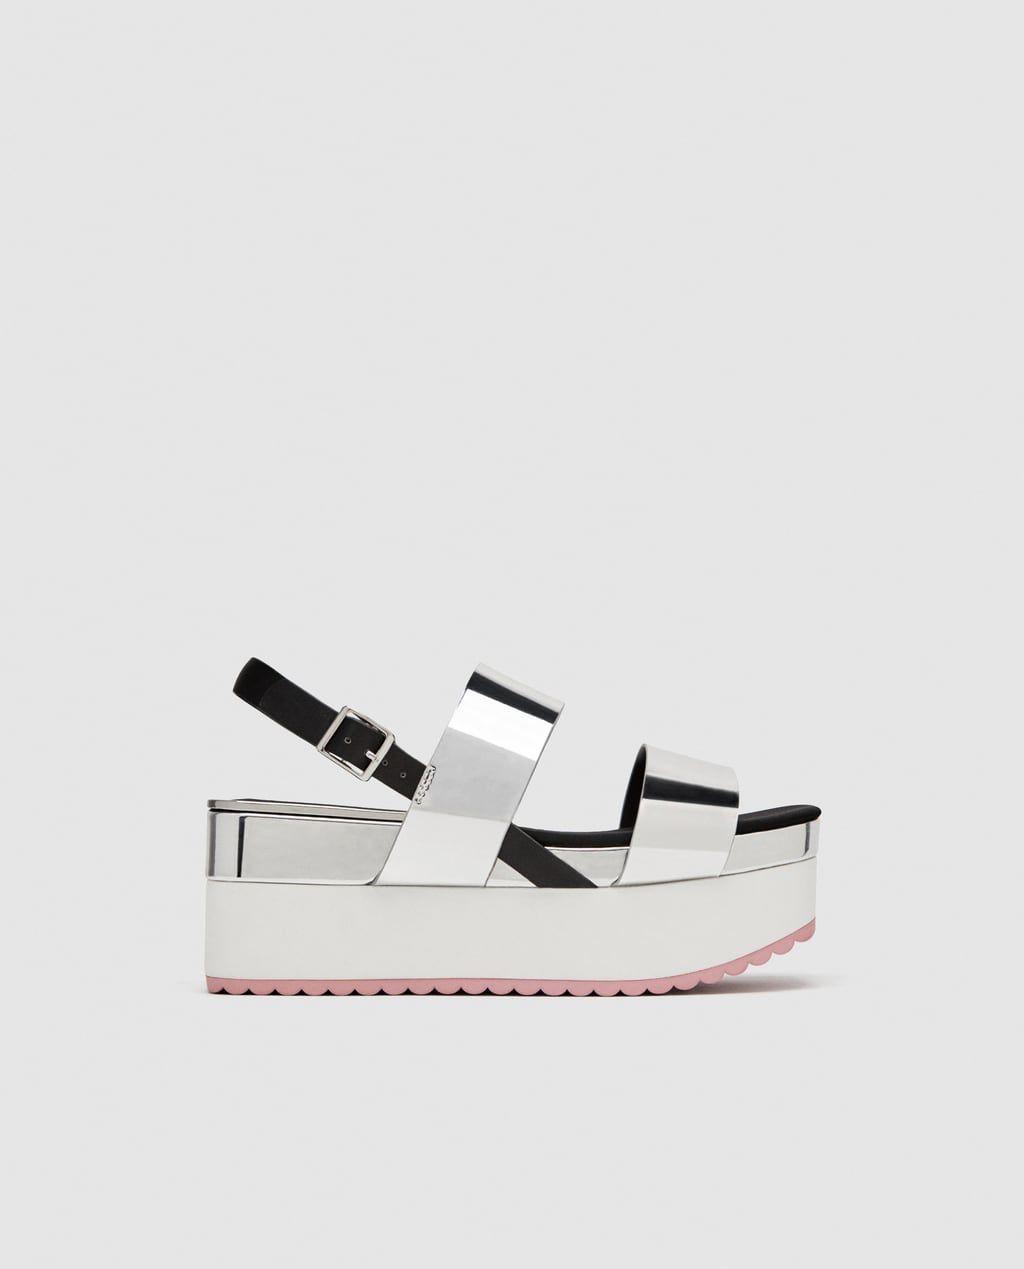 Sandaly Na Koturnie Z Paskami W Kolorze Srebrnym Sandals Women Shoes Shoes